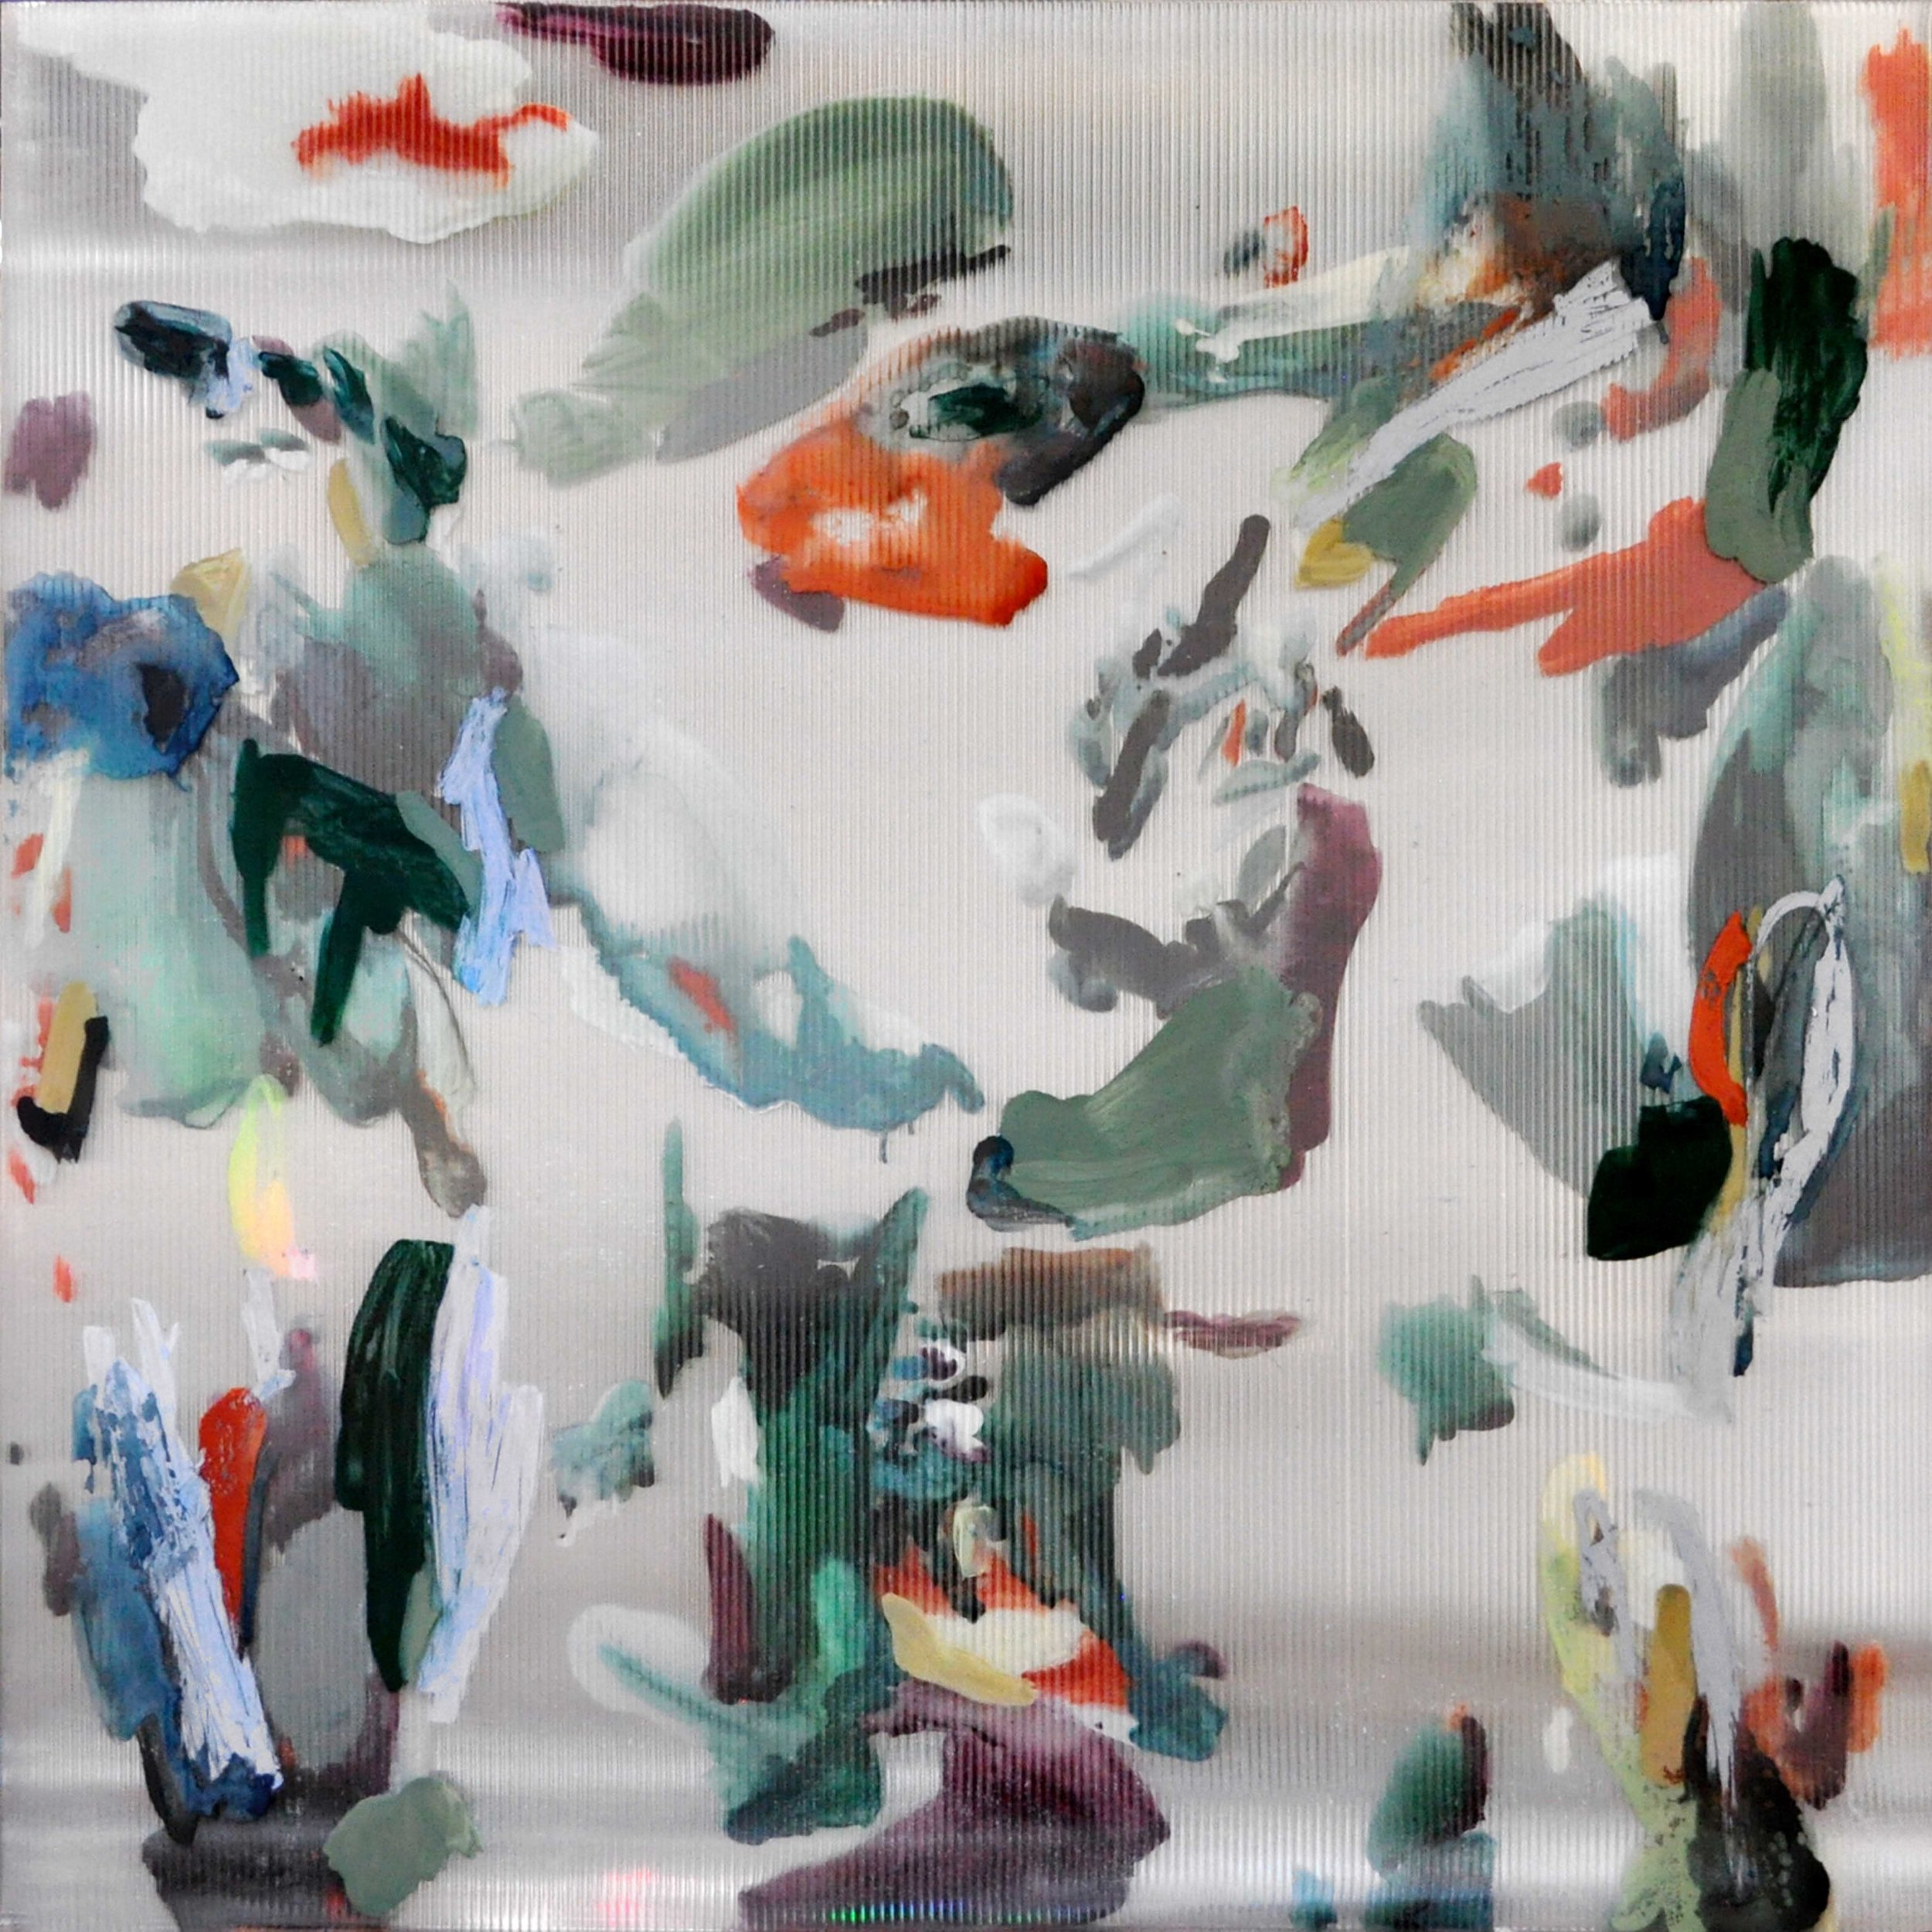 Untitled (Veranda) , gouache, oil, ink, acrylic on polycarbonate, 120 x 120 cm, 2016